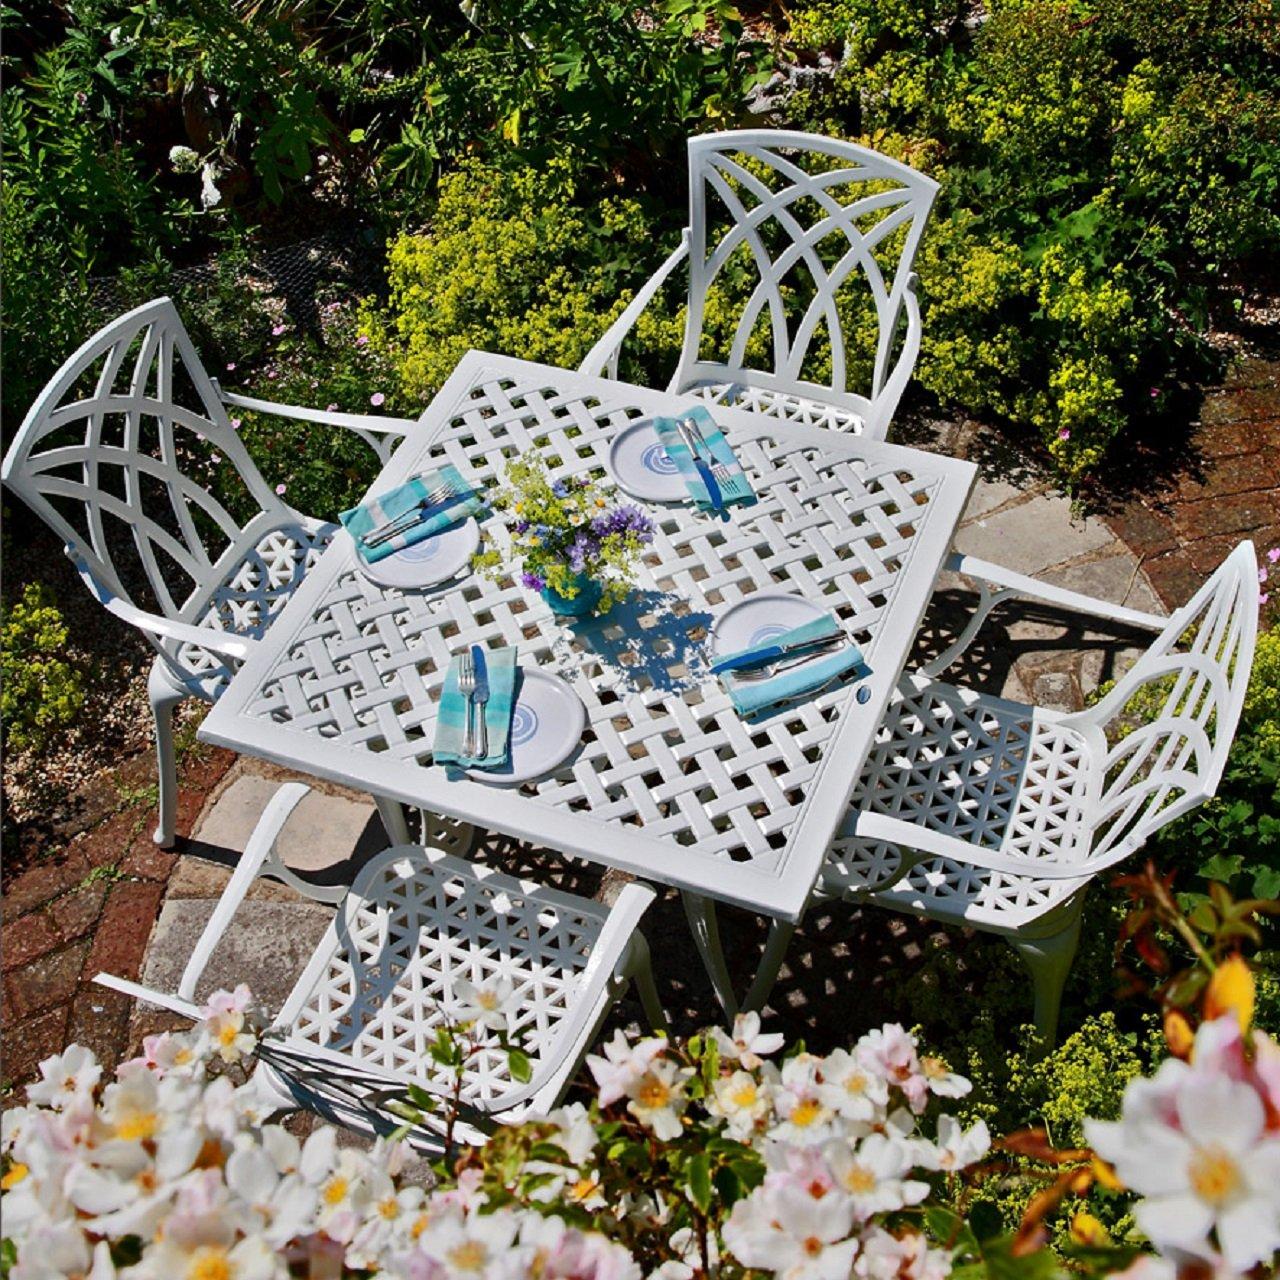 wei es lucy 91cm quadratisches gartenm belset aluminium 1 wei er lucy tisch 4 wei e april. Black Bedroom Furniture Sets. Home Design Ideas